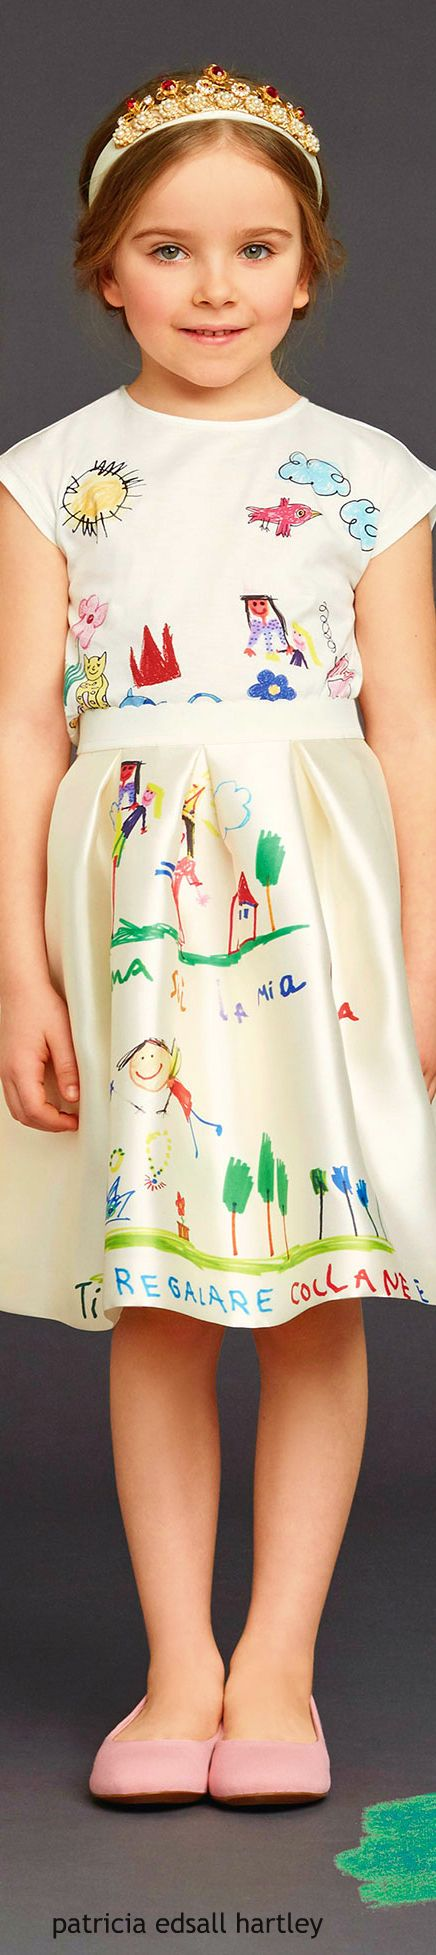 Childrenswear Lilica Ripilica Spring-Summer  Dolce & Gabbana - Winter 2016